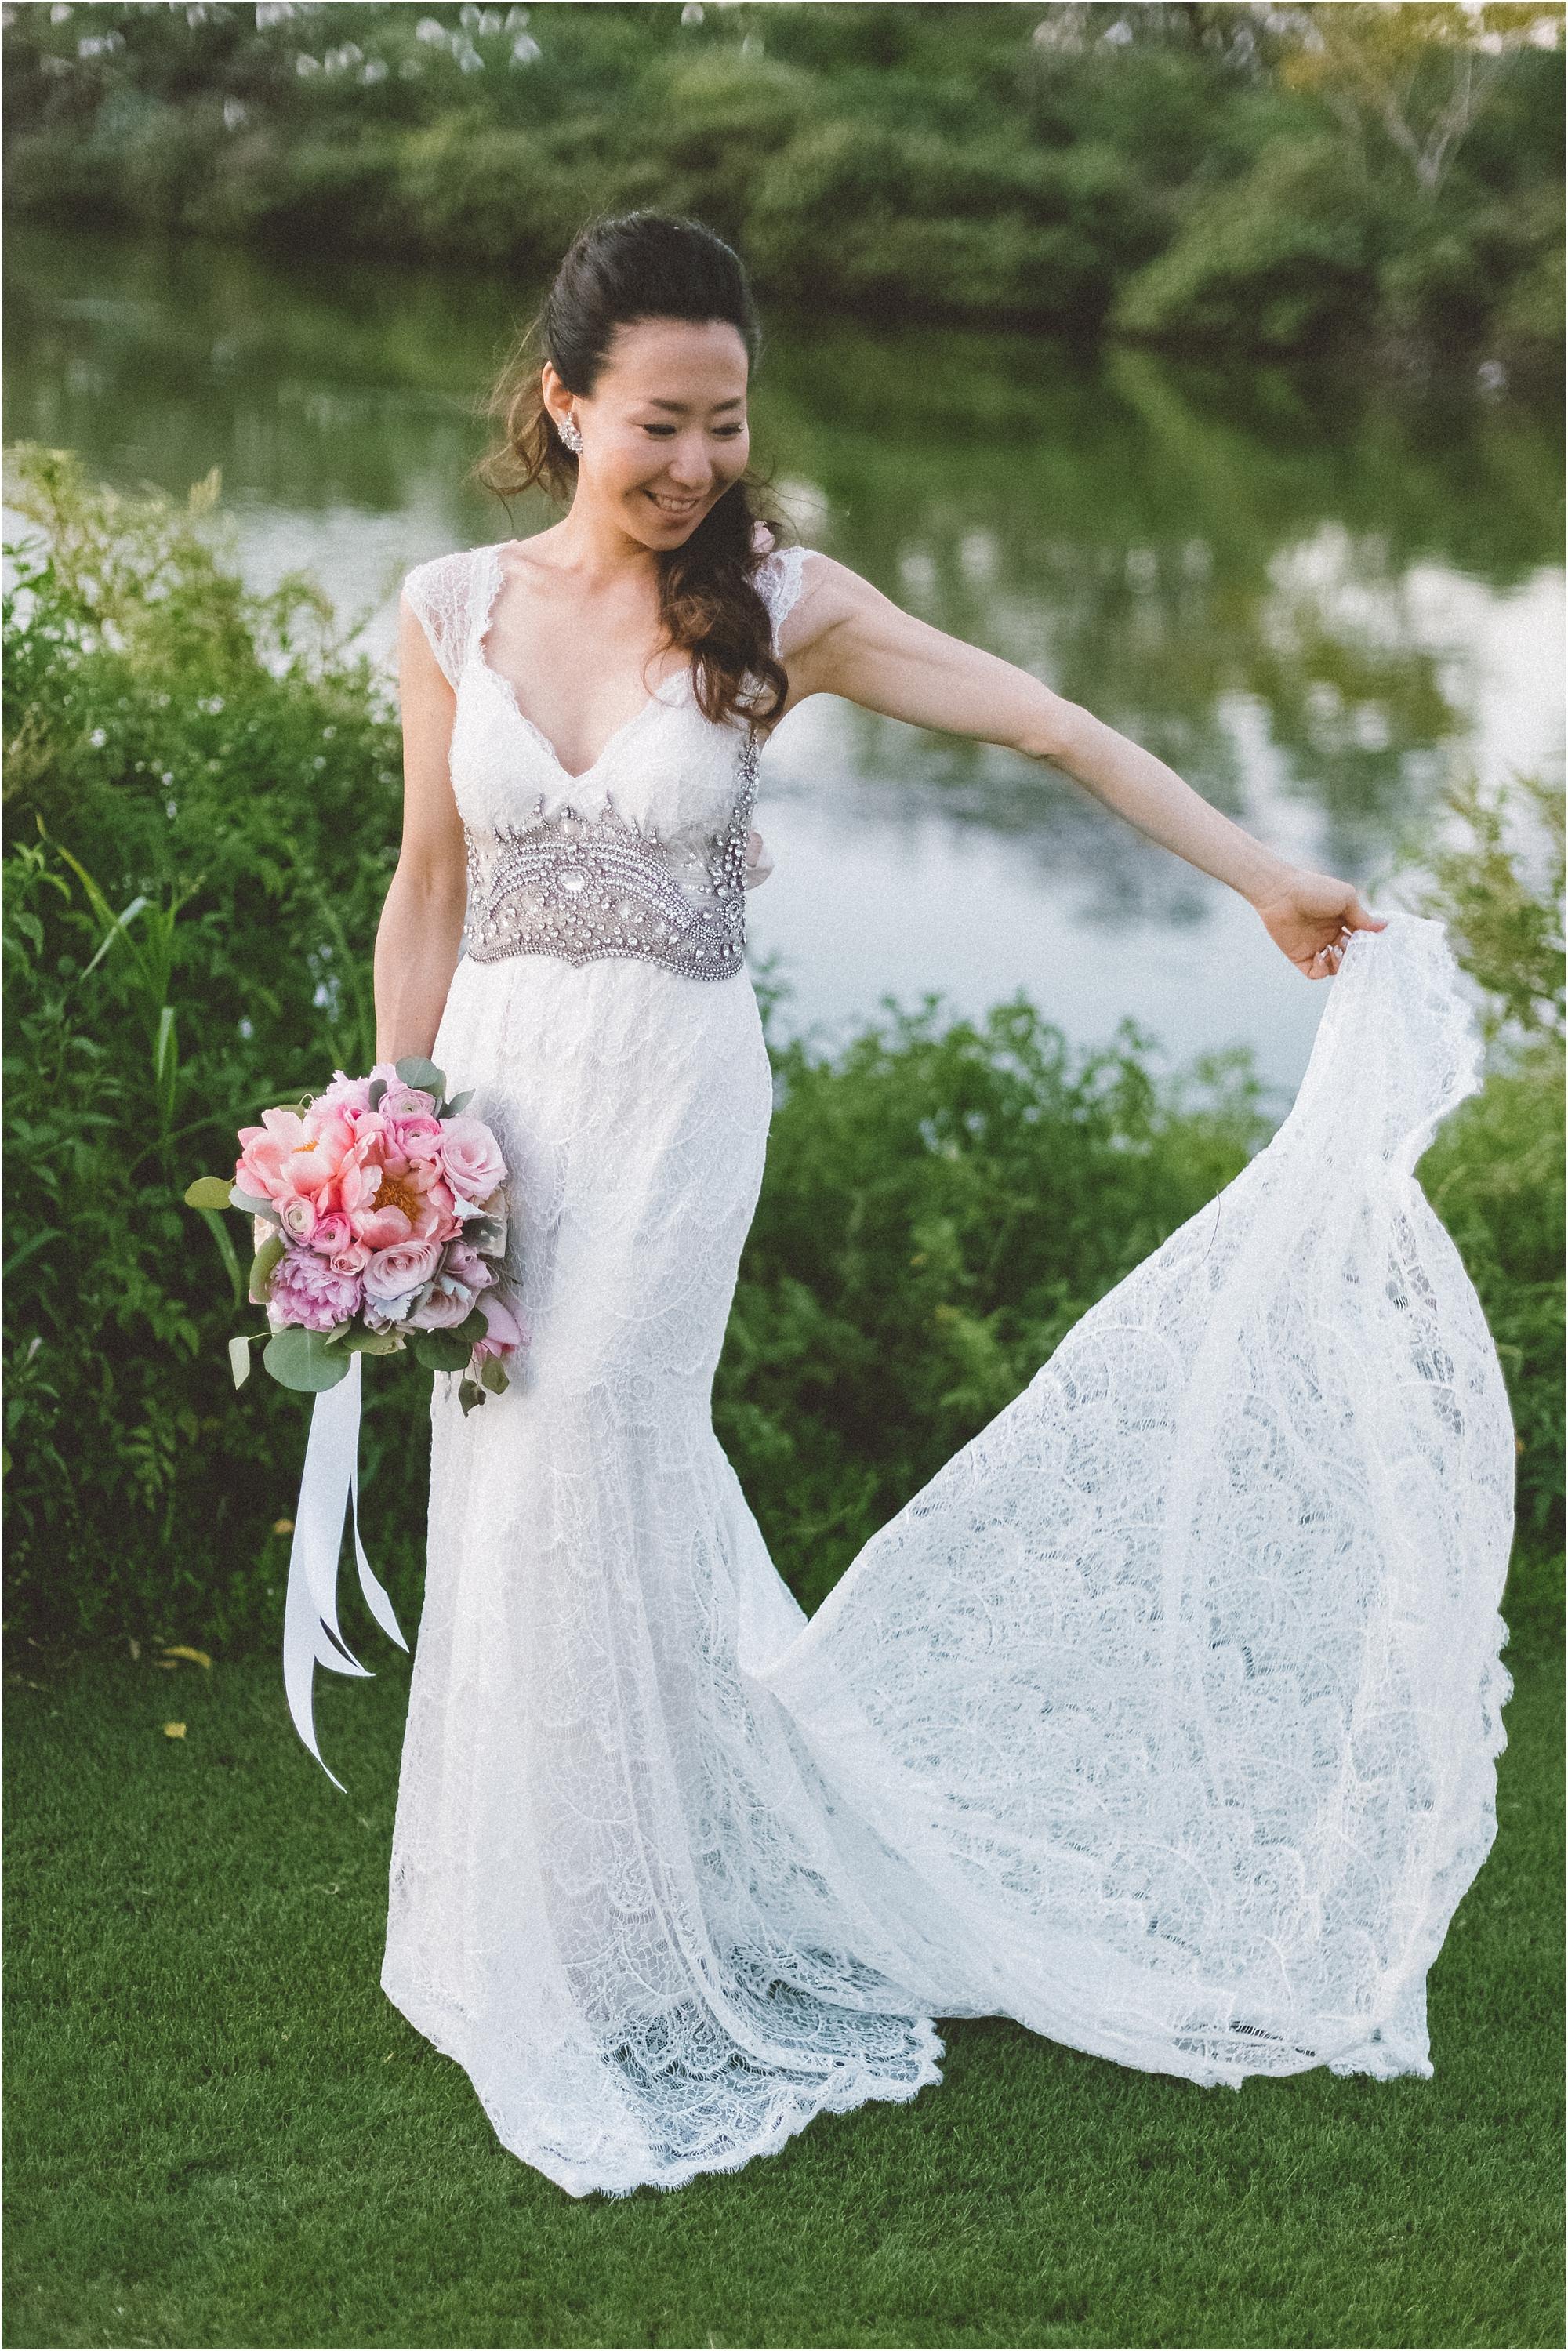 angie-diaz-photography-maui-hawaii-destination-wedding-makena-golf-beach-club_0066.jpg